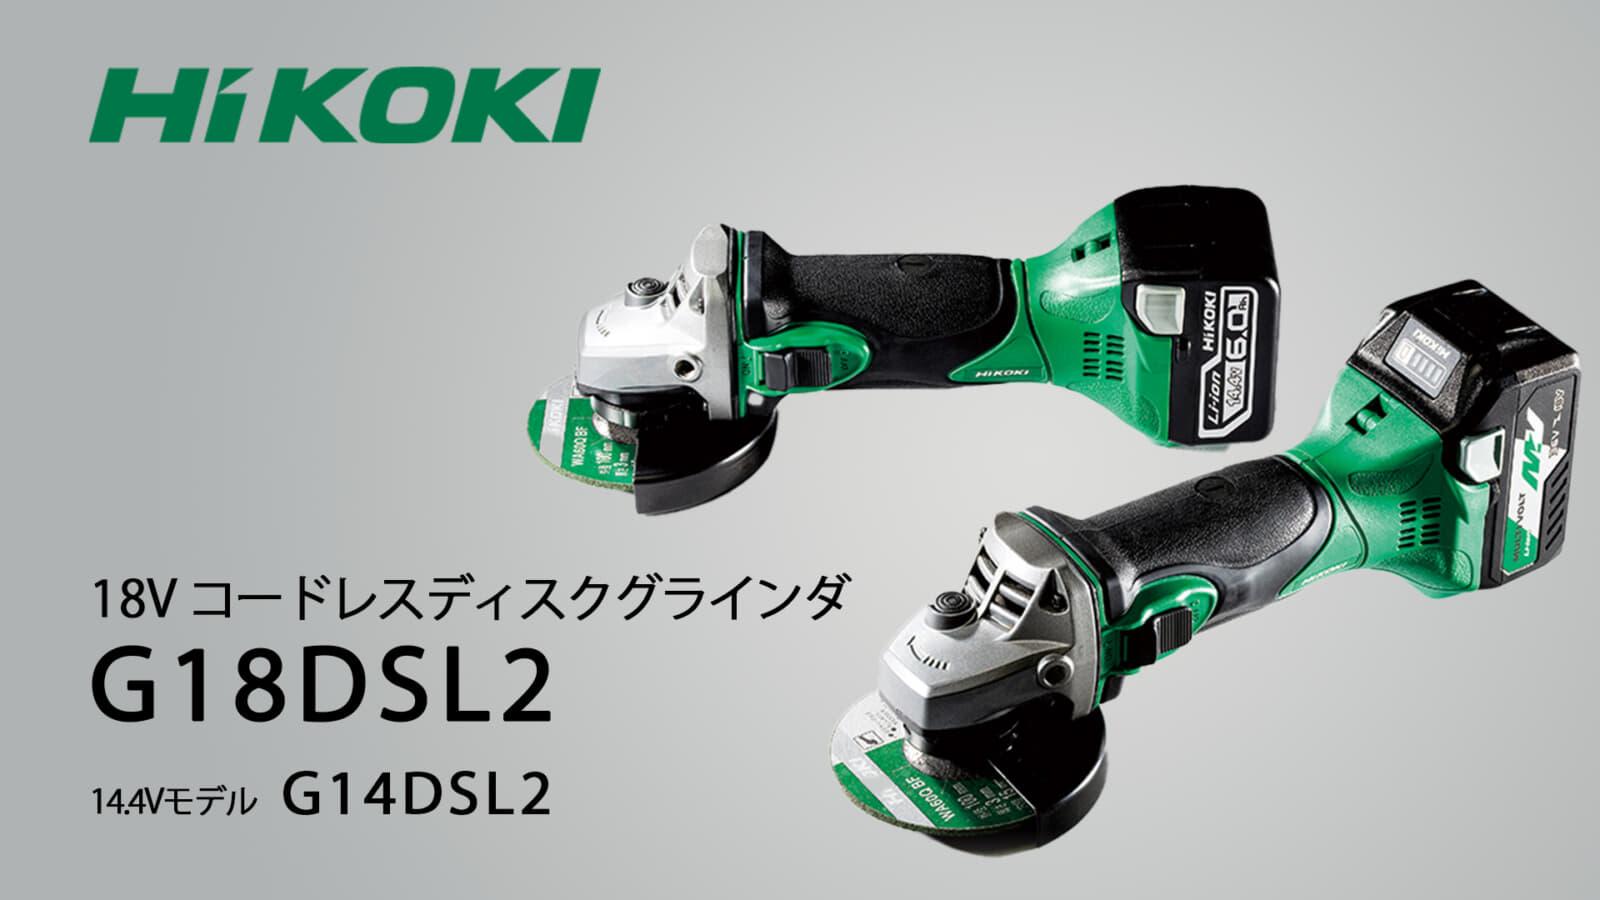 HiKOKI G18DSL2 コードレスディスクグラインダを発売、過負荷耐力アップ